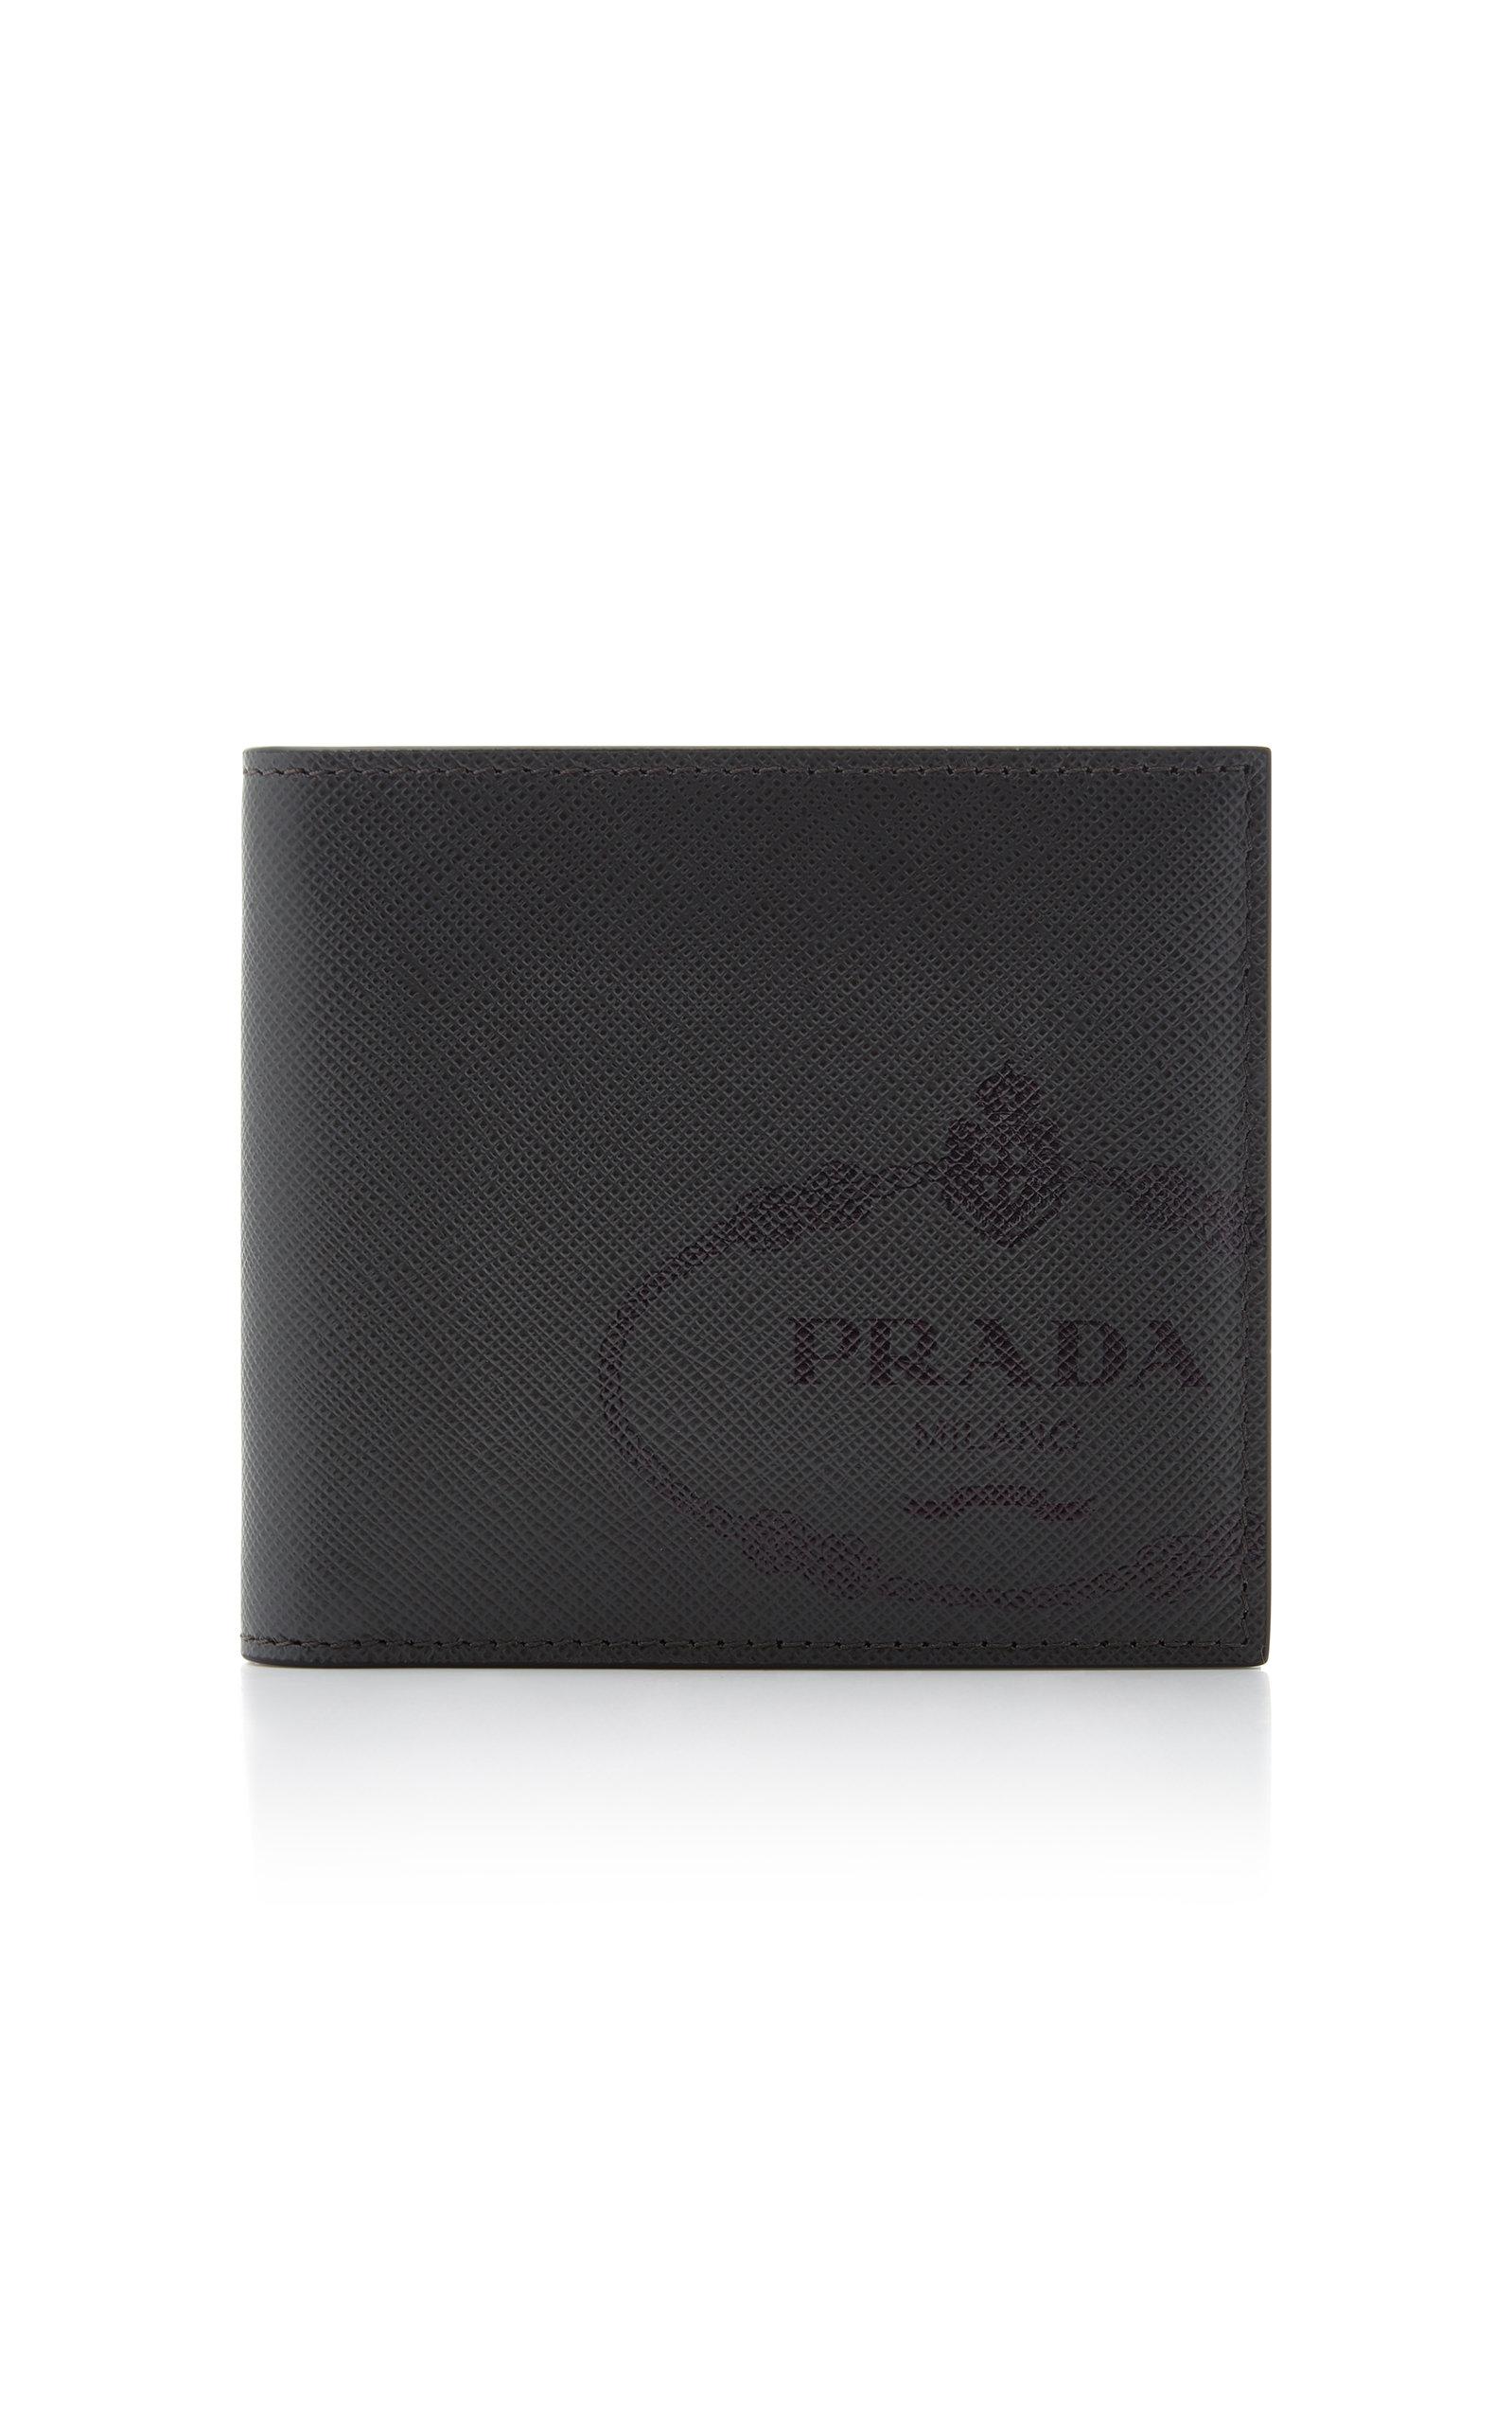 90612ee62779c2 PRADA TEXTURED-LEATHER WALLET. #prada | Prada in 2019 | Leather ...